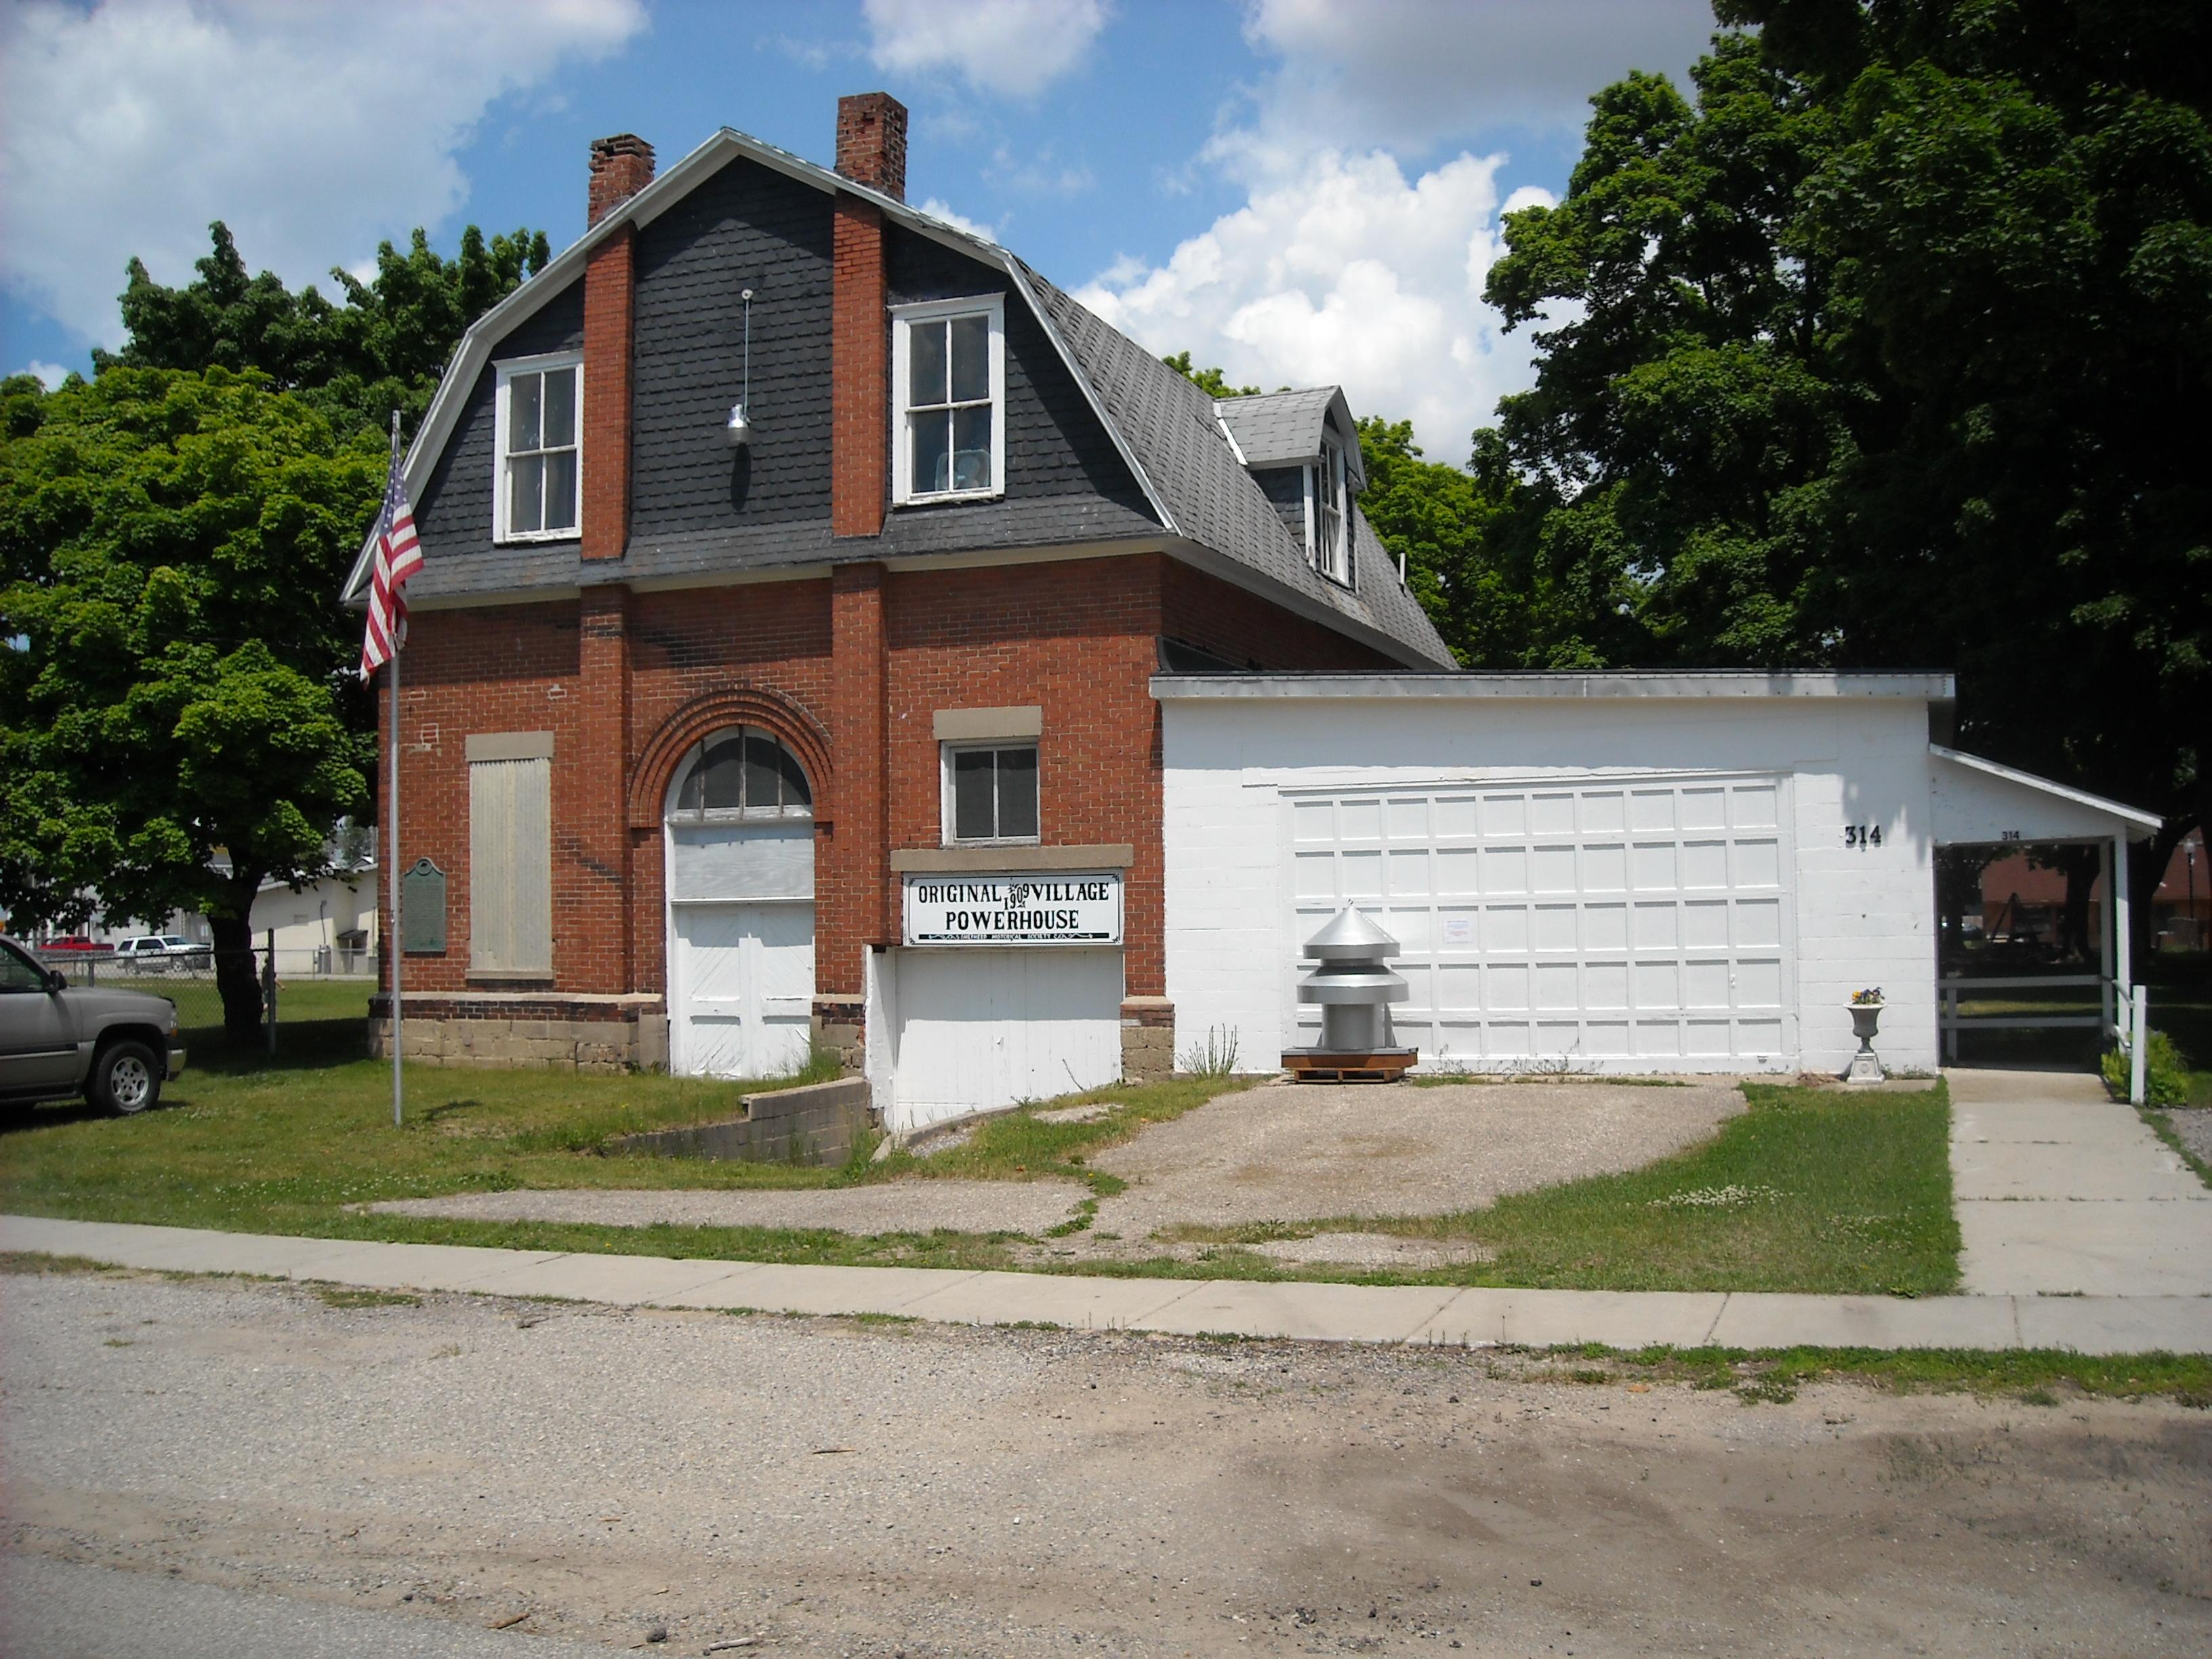 Shepherd Village Power House Museum